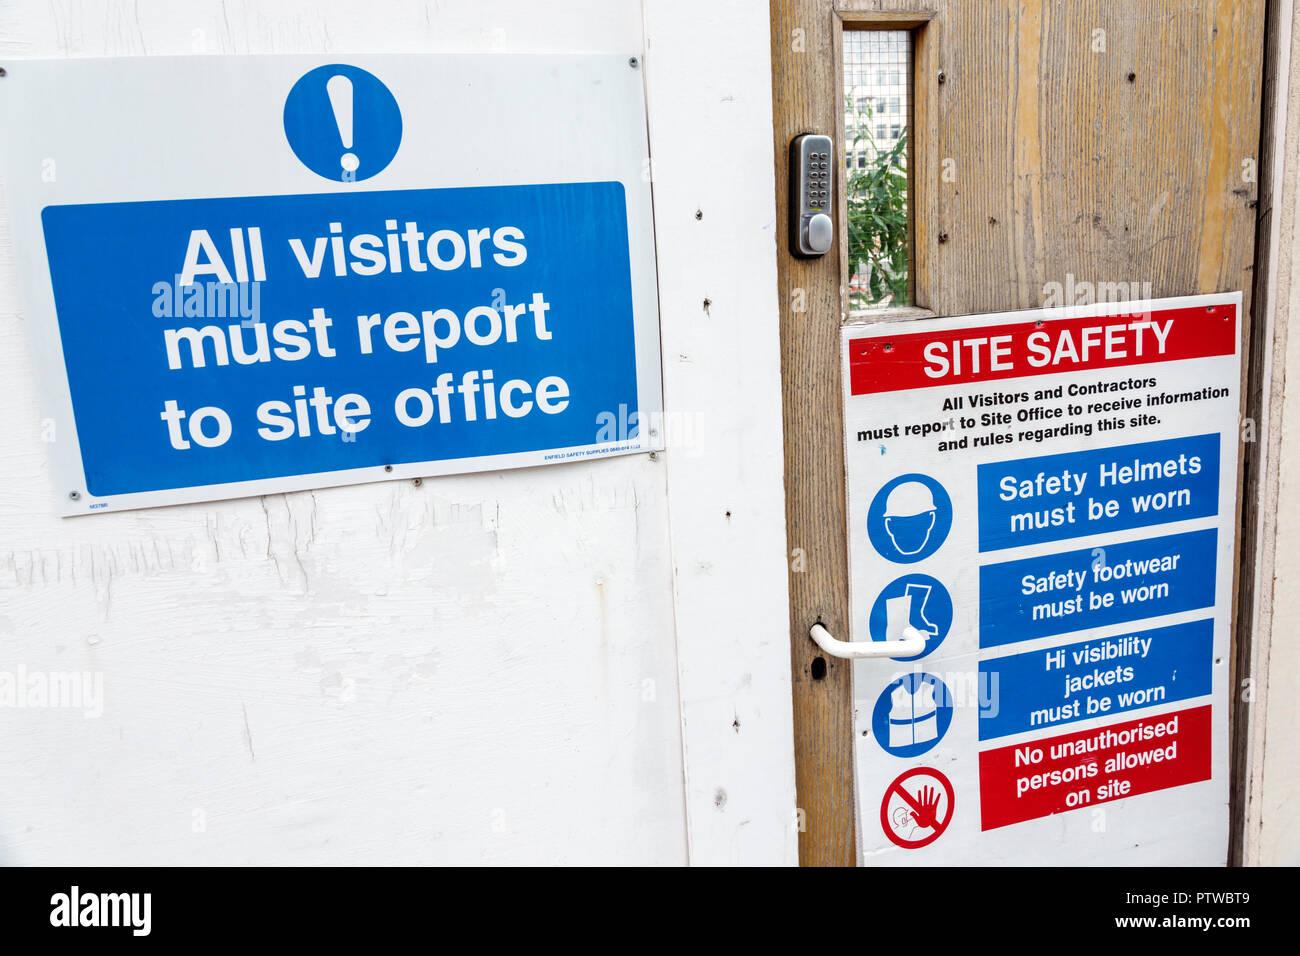 Londres Reino Unido Gran Bretaña Southwark sitio en construcción oficina entrada directrices normas de seguridad cascos cascos footwea adecuada Imagen De Stock